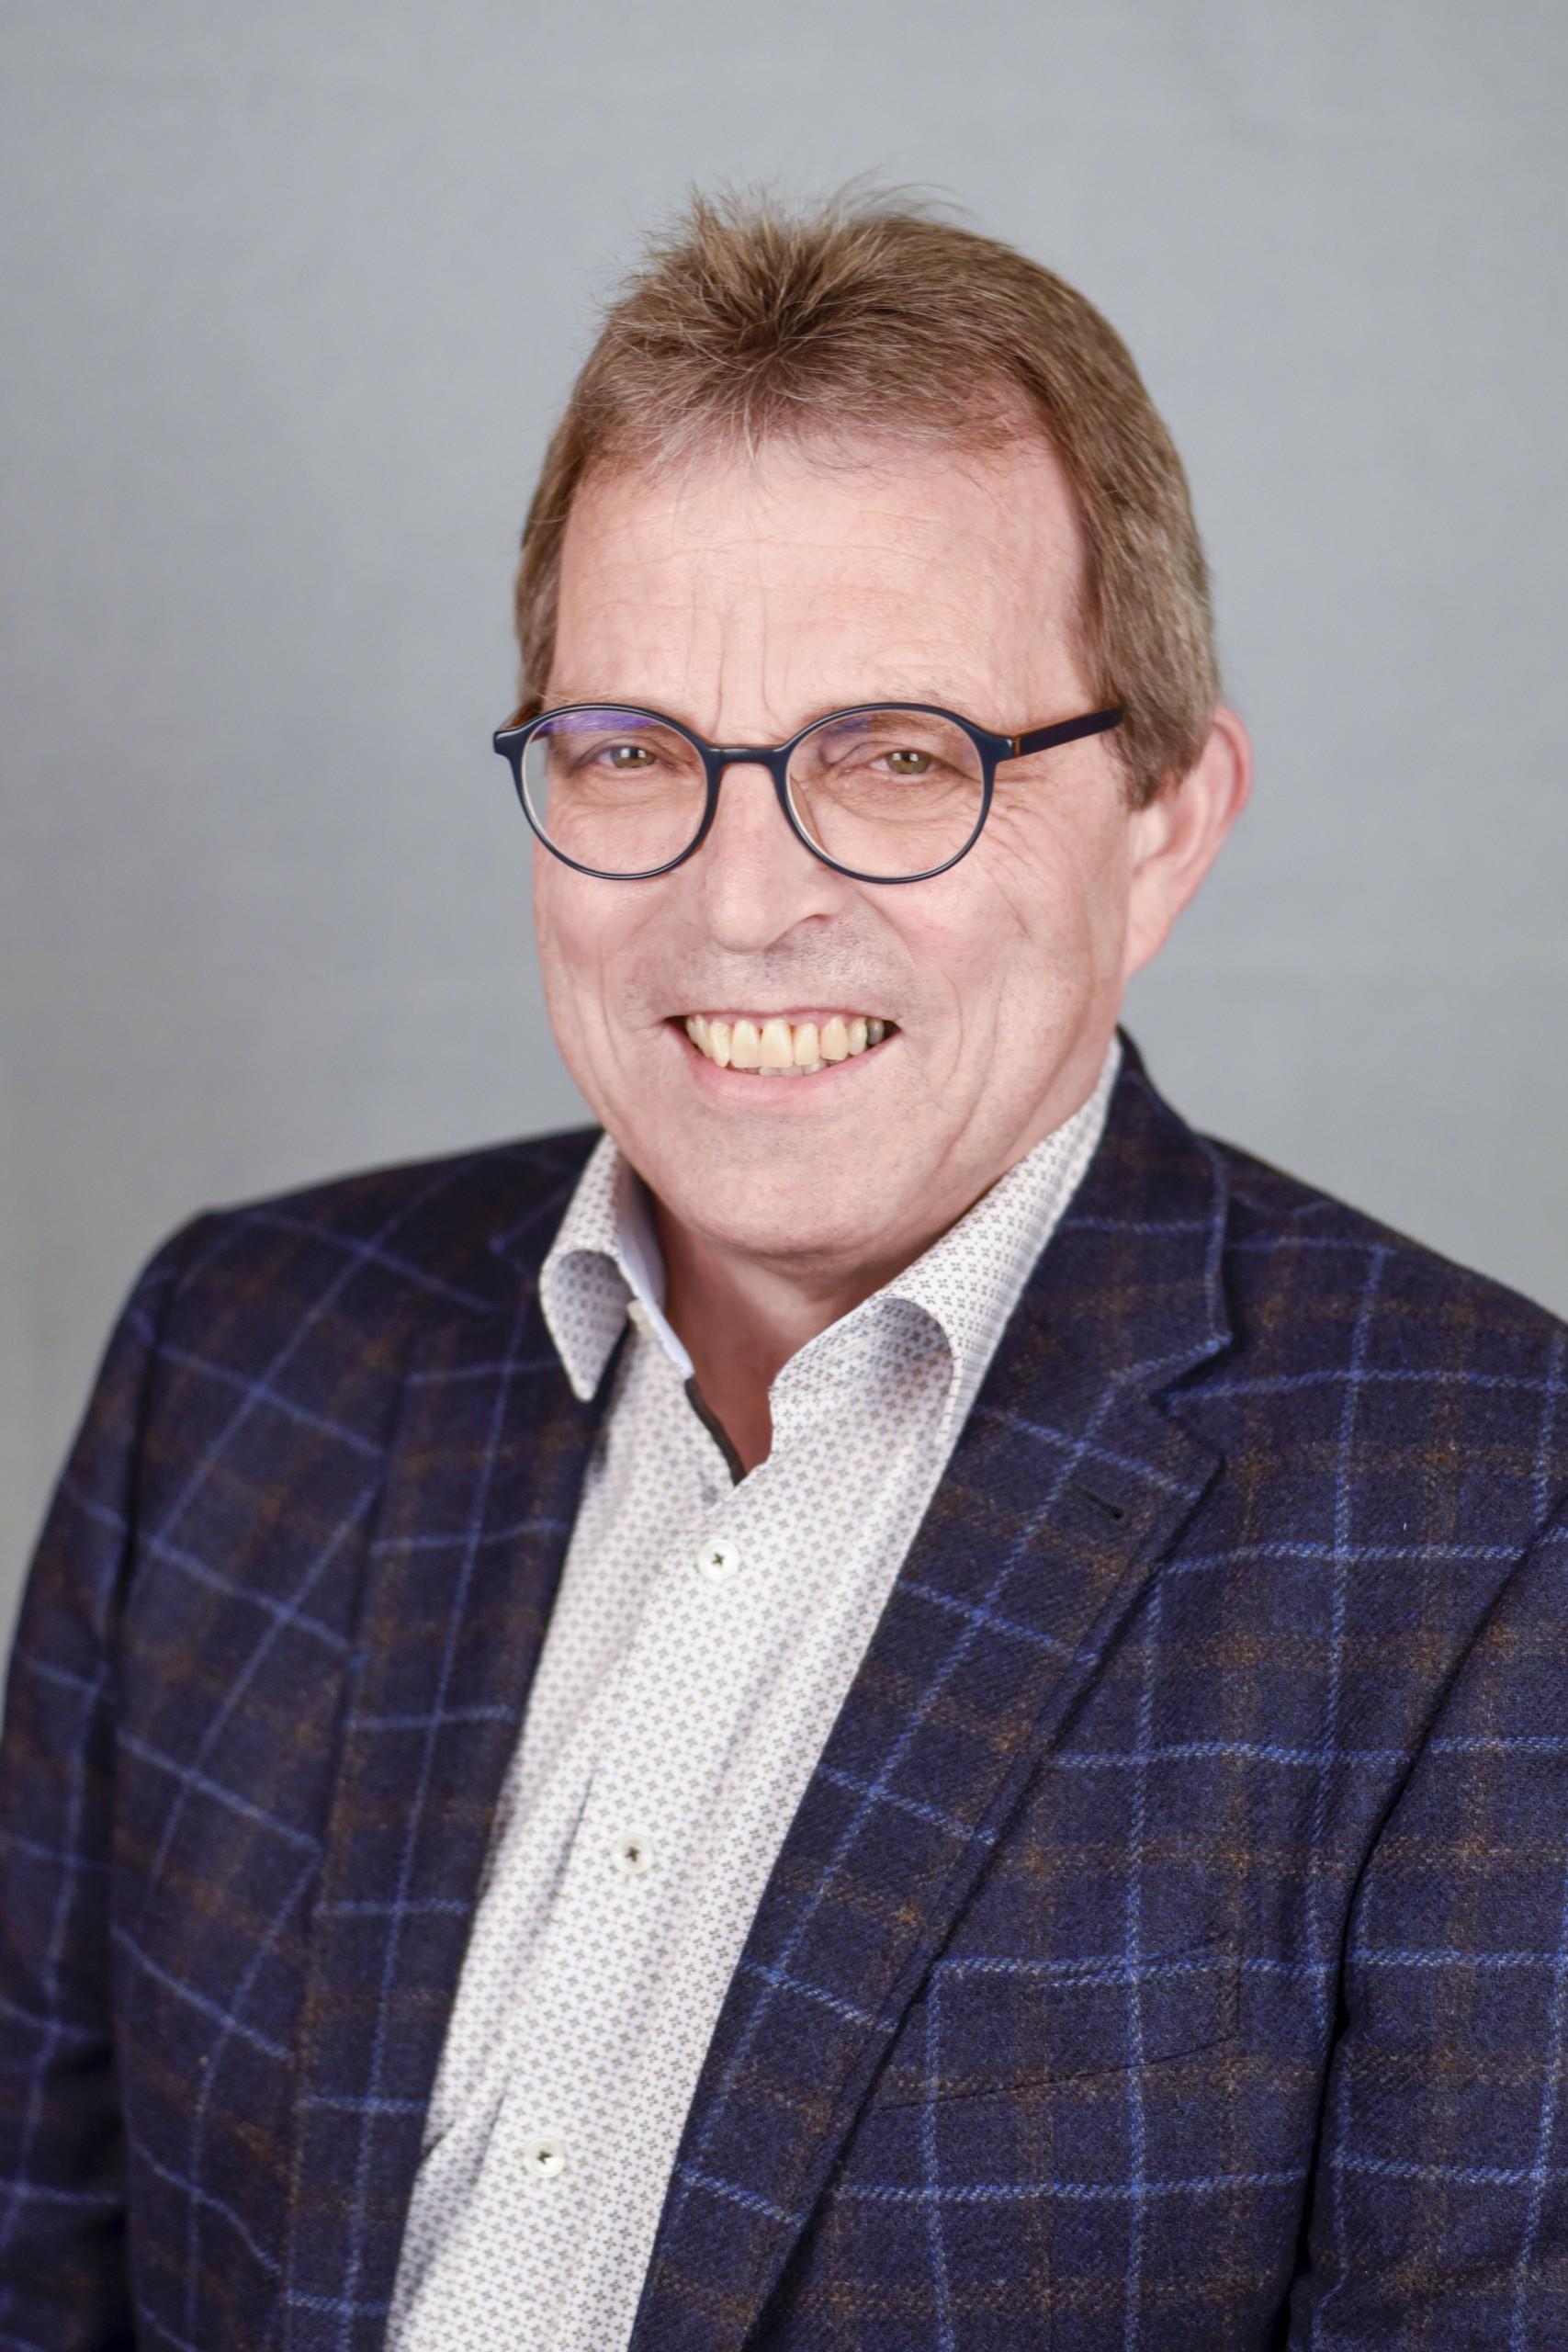 Gerhard Rinkes